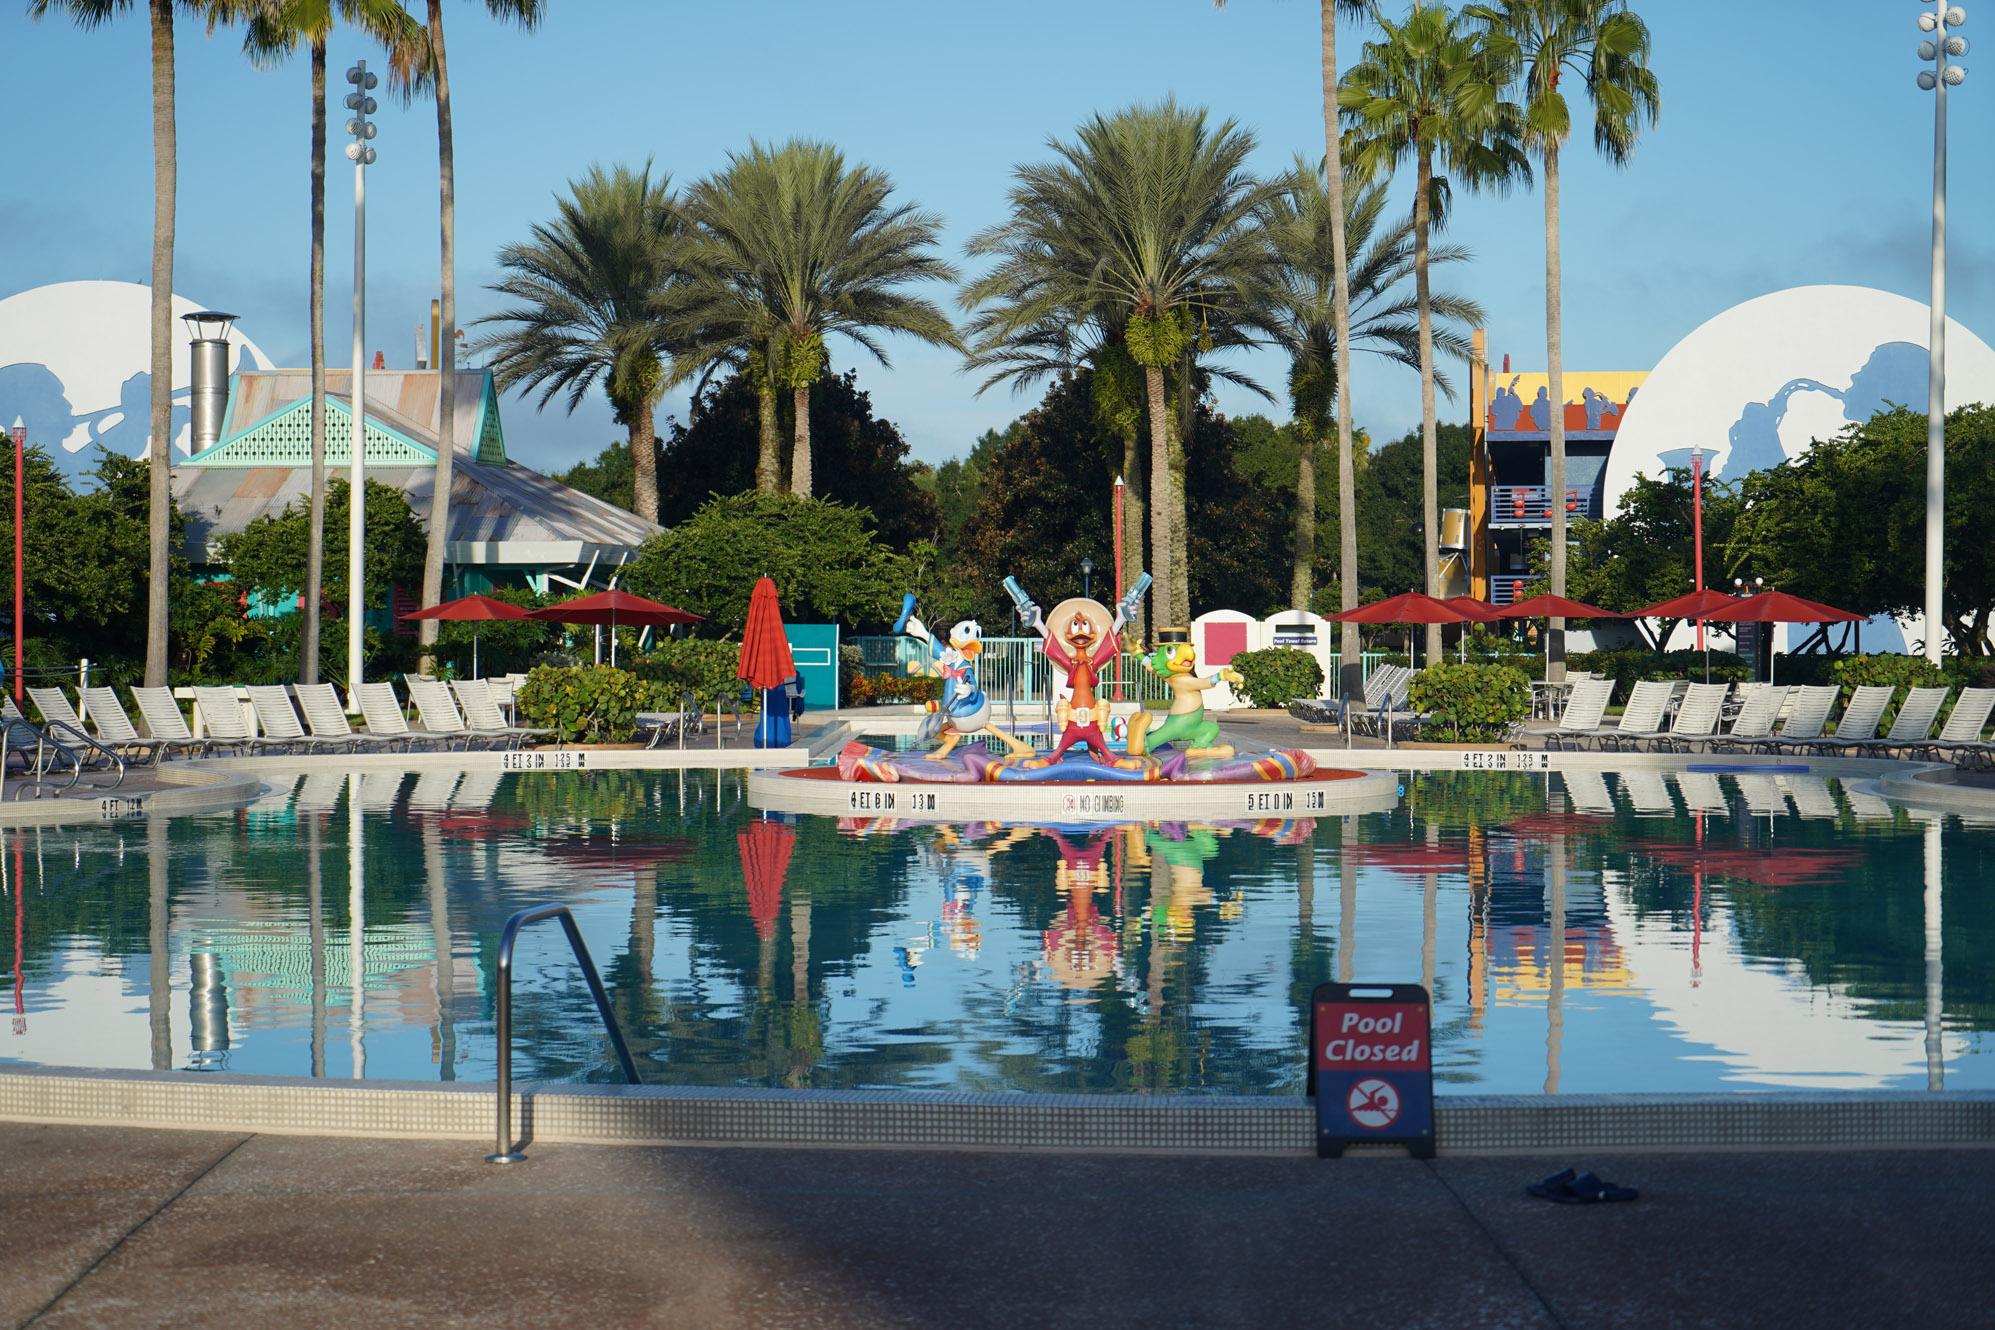 Disney's All-Star Movies Resort pool